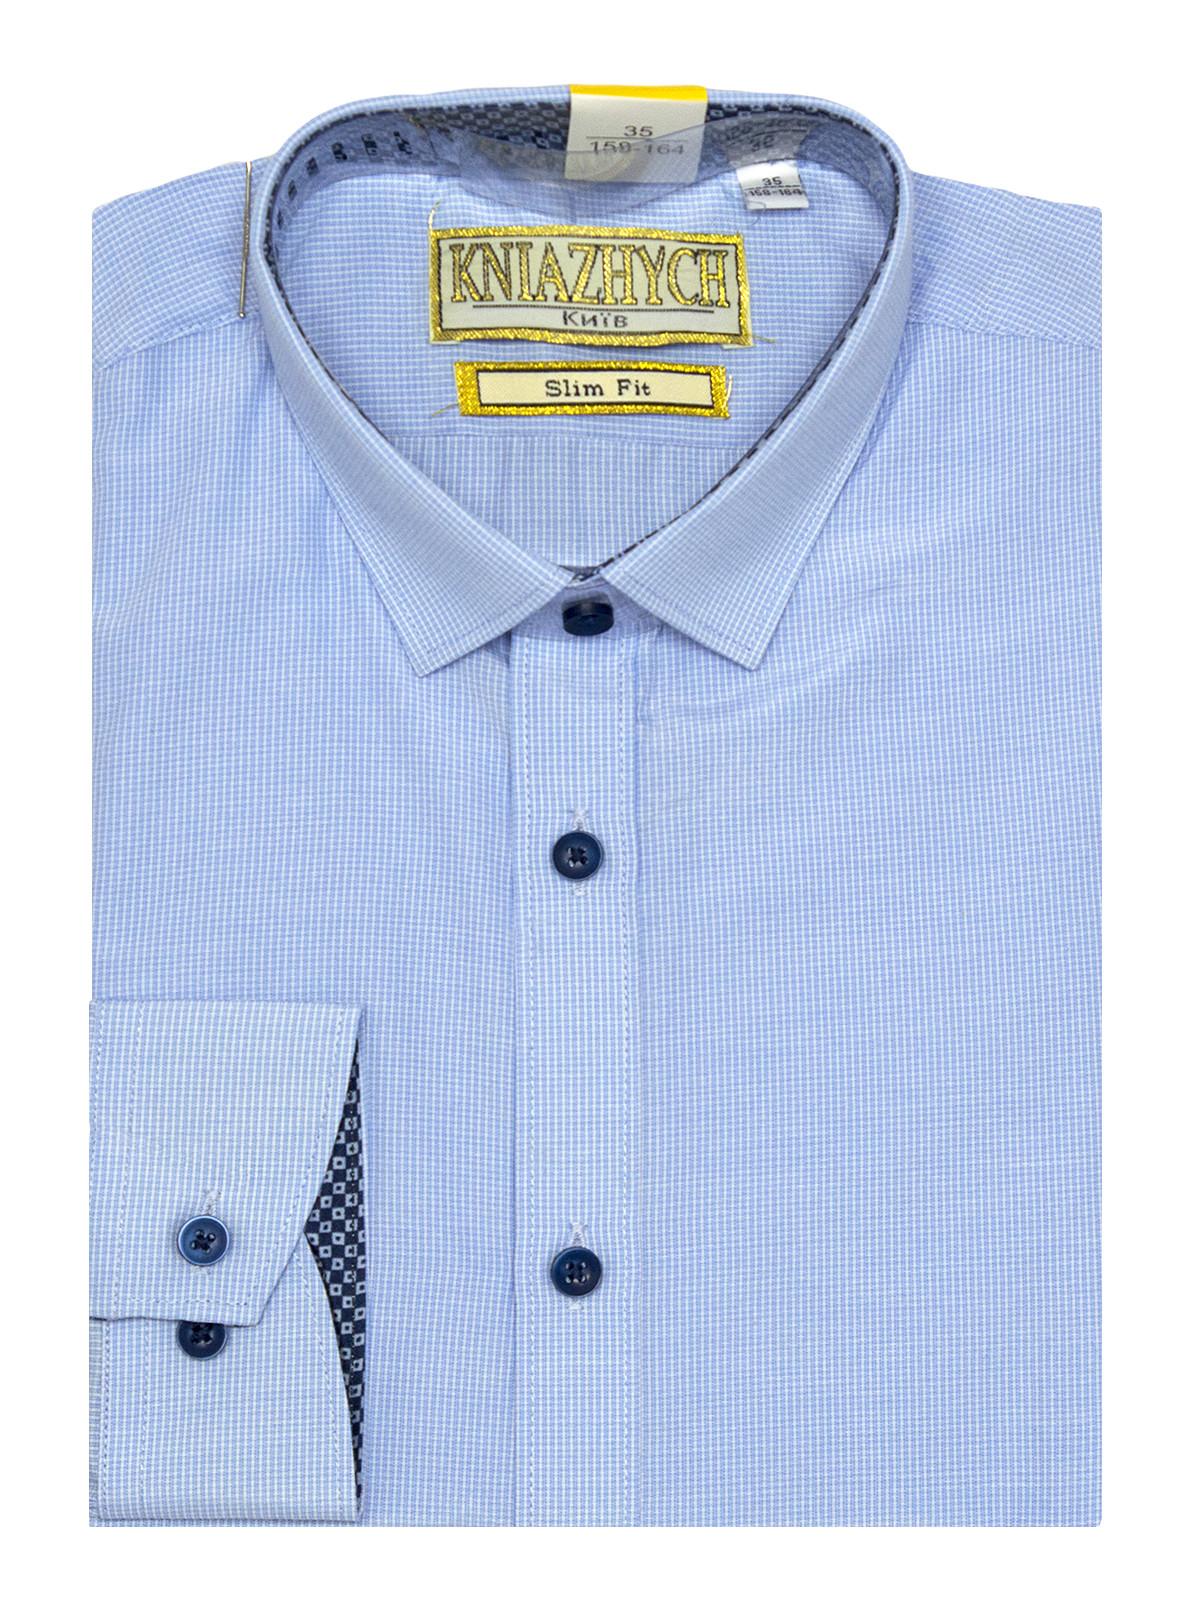 Рубашка для мальчика, арт. Kassel 6 slim, возраст от 6 до 15 лет